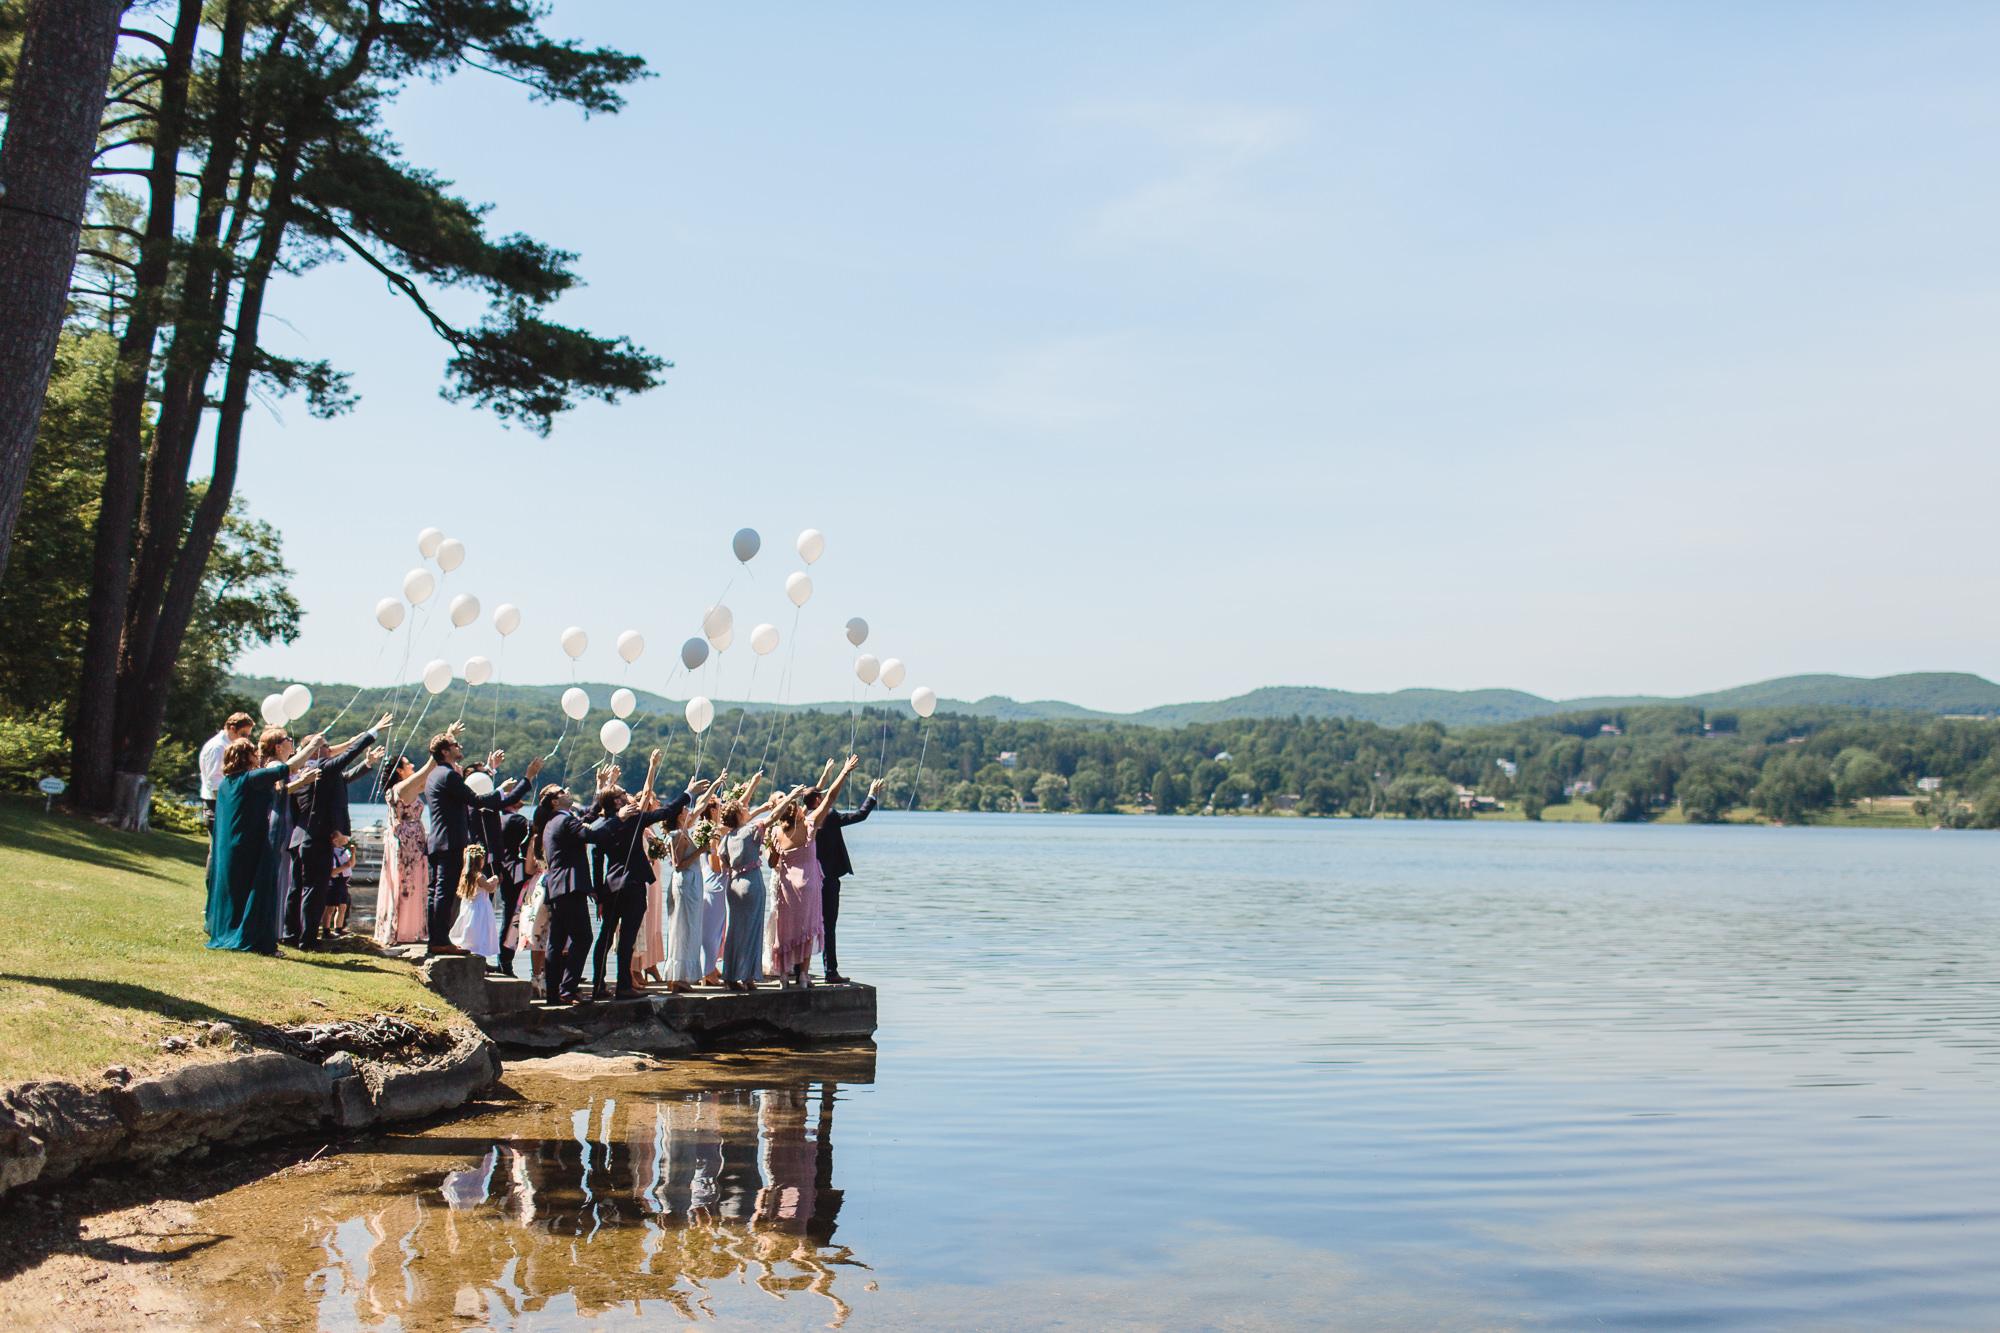 connecticut-summer-lake-wedding-emily-kirke-photography-upstyle (67 of 181).jpg